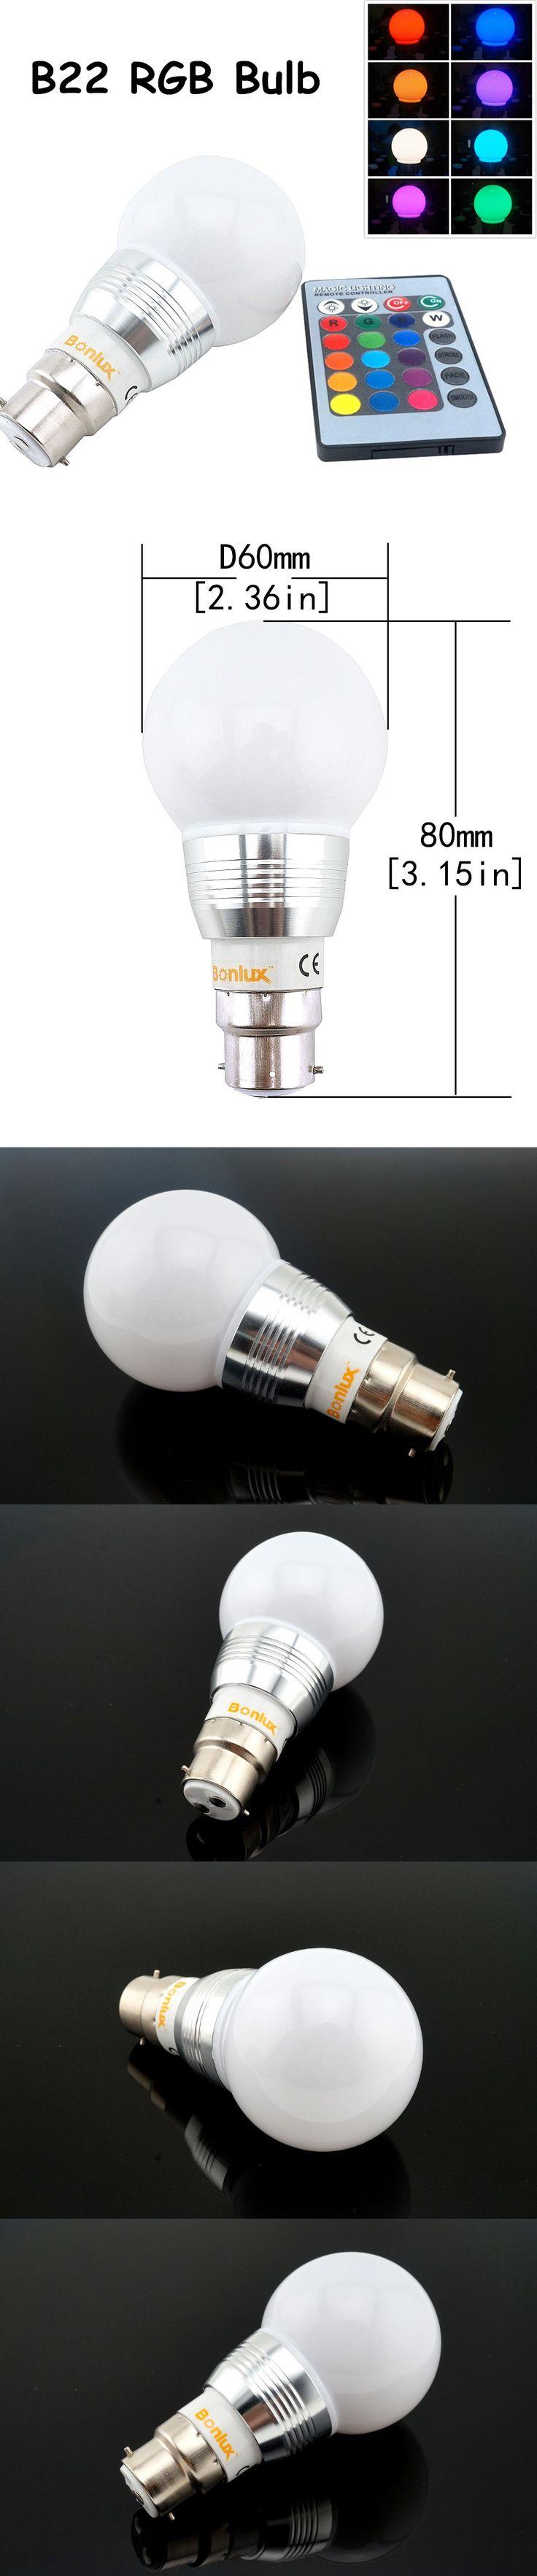 LED B22 RGB Light Bulb 3W 110V 220V A60 Bayonet Spotlight Bulb RGB LED Ball Light with RGB remote controller for Home Decoration $6.66